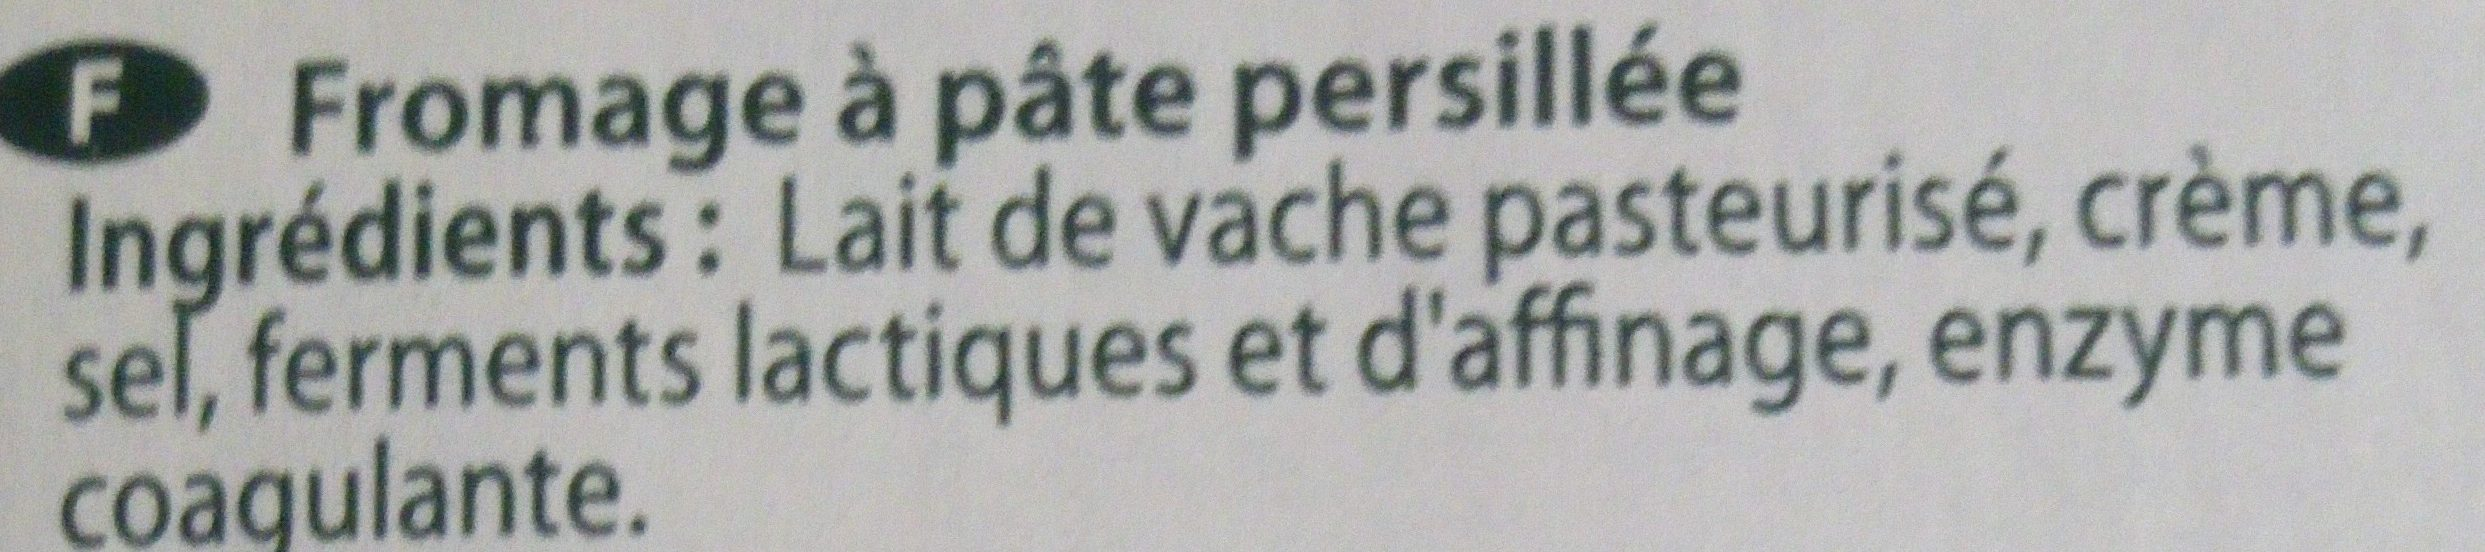 Bleu Doux De France - Ingrediënten - fr